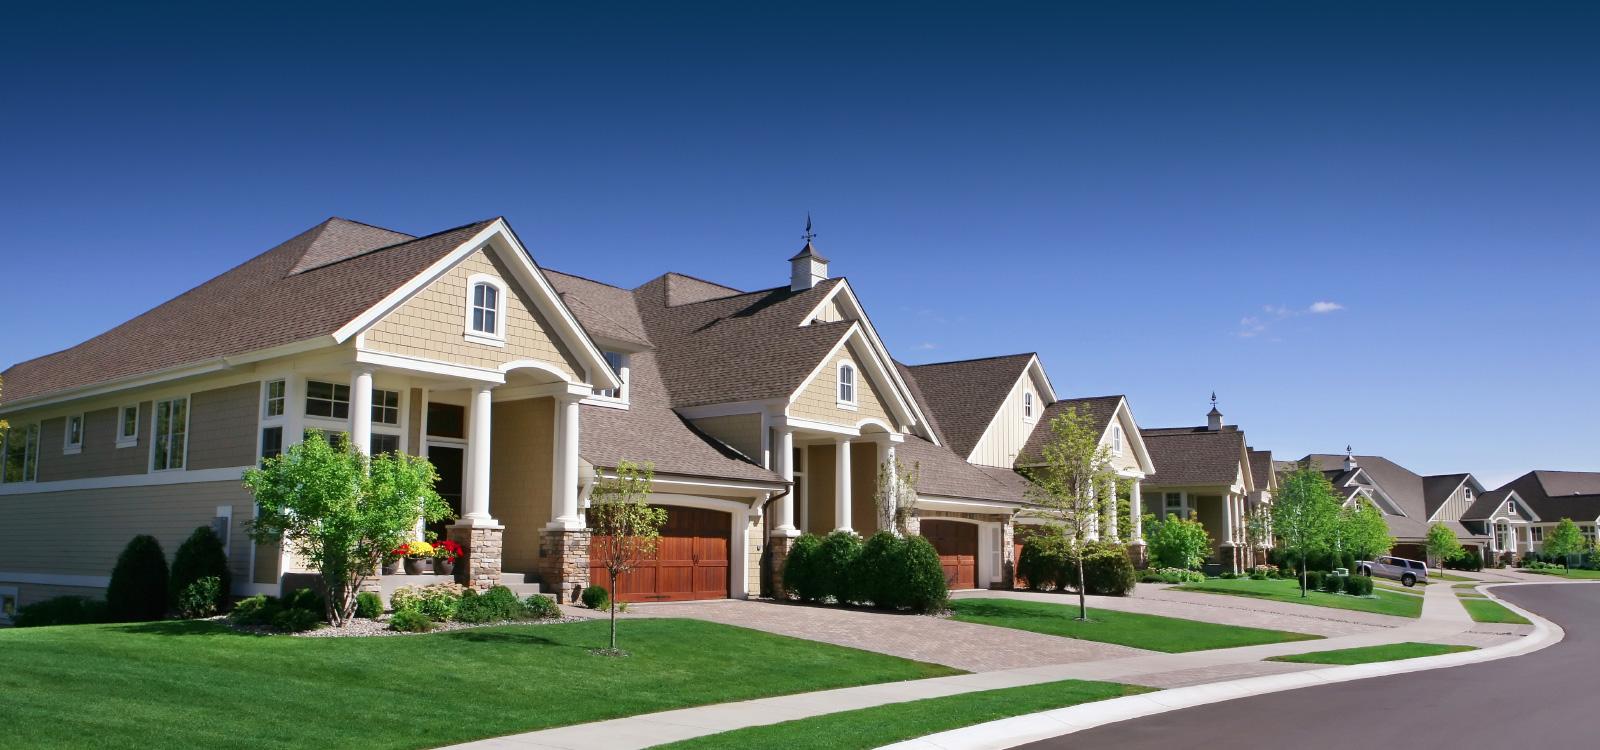 Home Inspection Checklist Gulfport